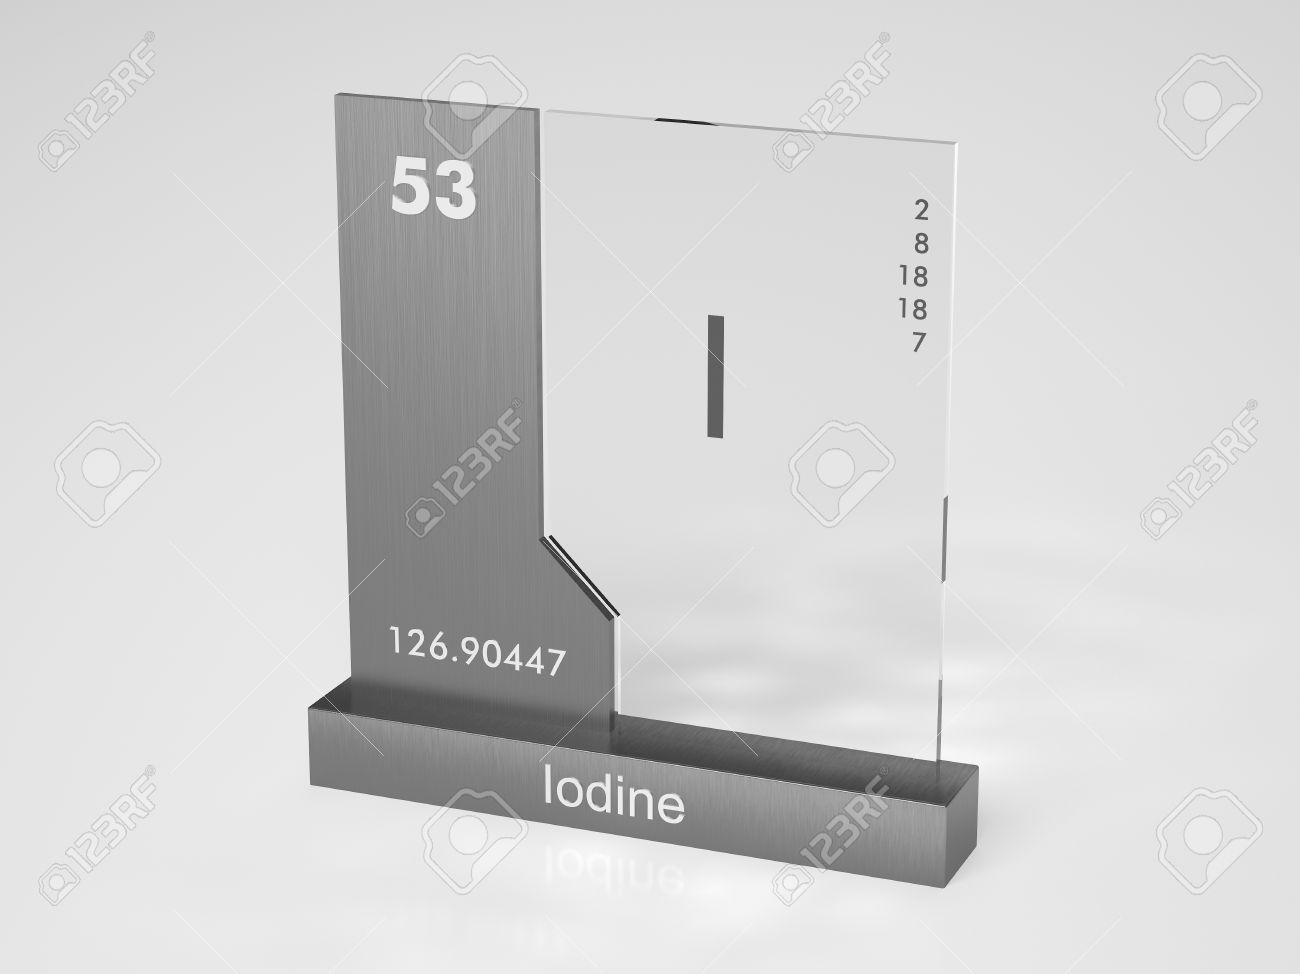 Yodo smbolo i elemento qumico de la tabla peridica fotos foto de archivo yodo smbolo i elemento qumico de la tabla peridica urtaz Image collections